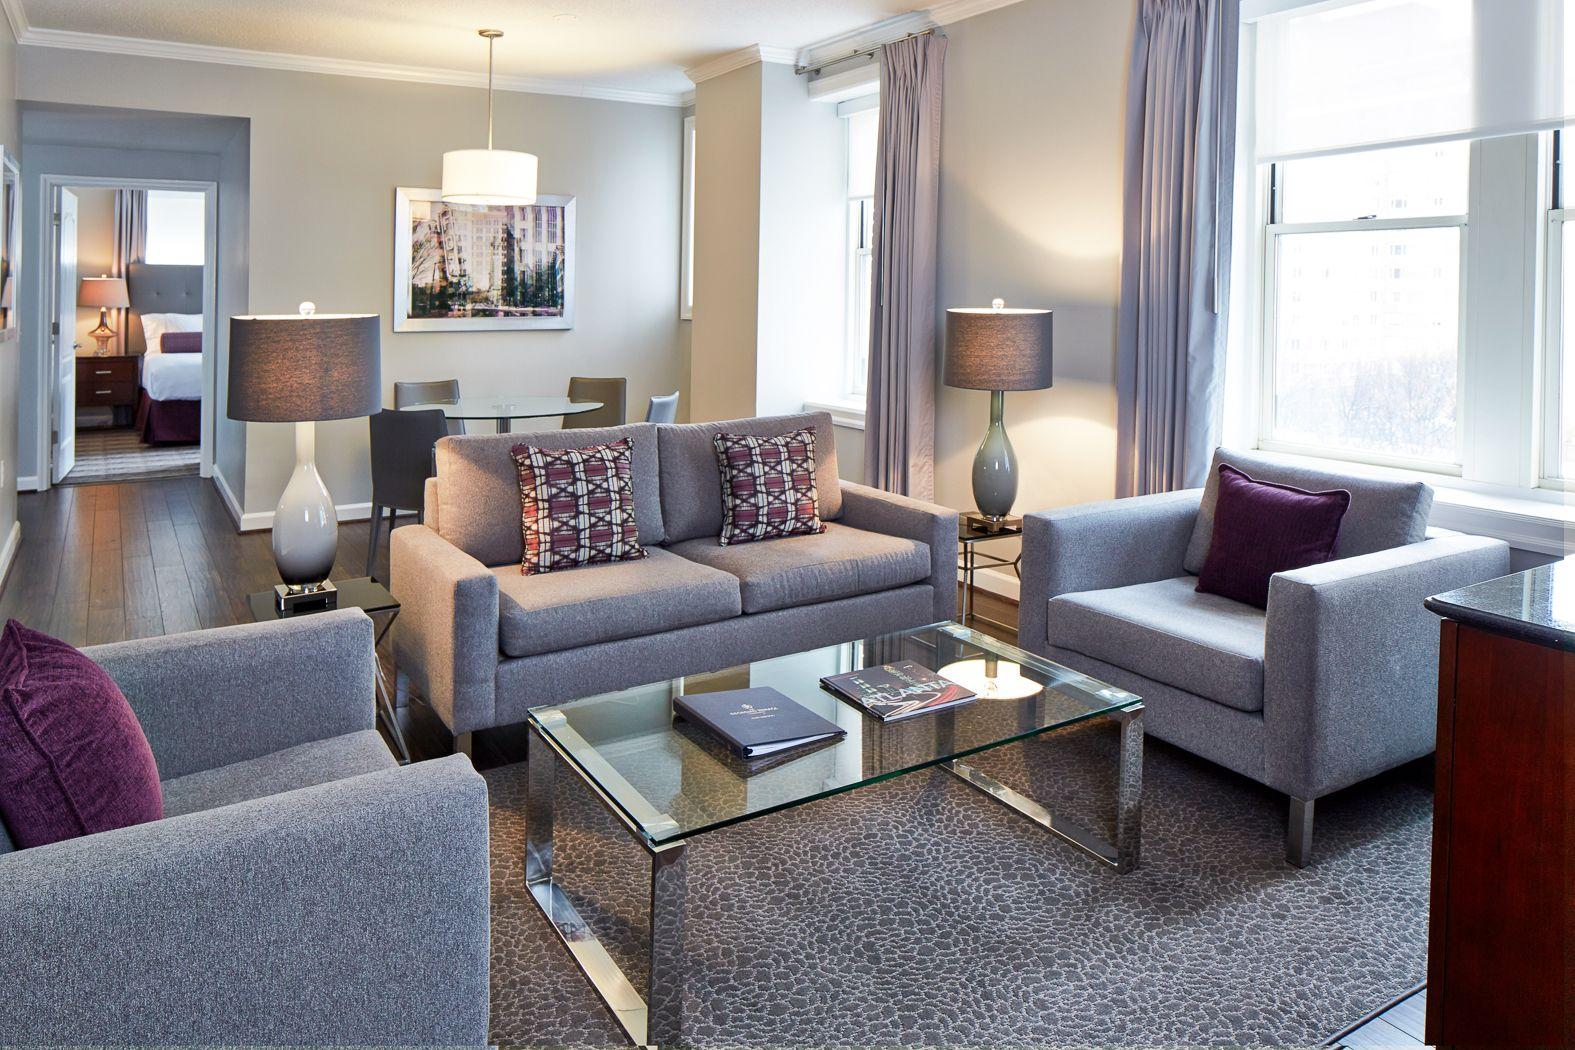 23 Colorful Bedroom Hotel Suites In Atlanta References